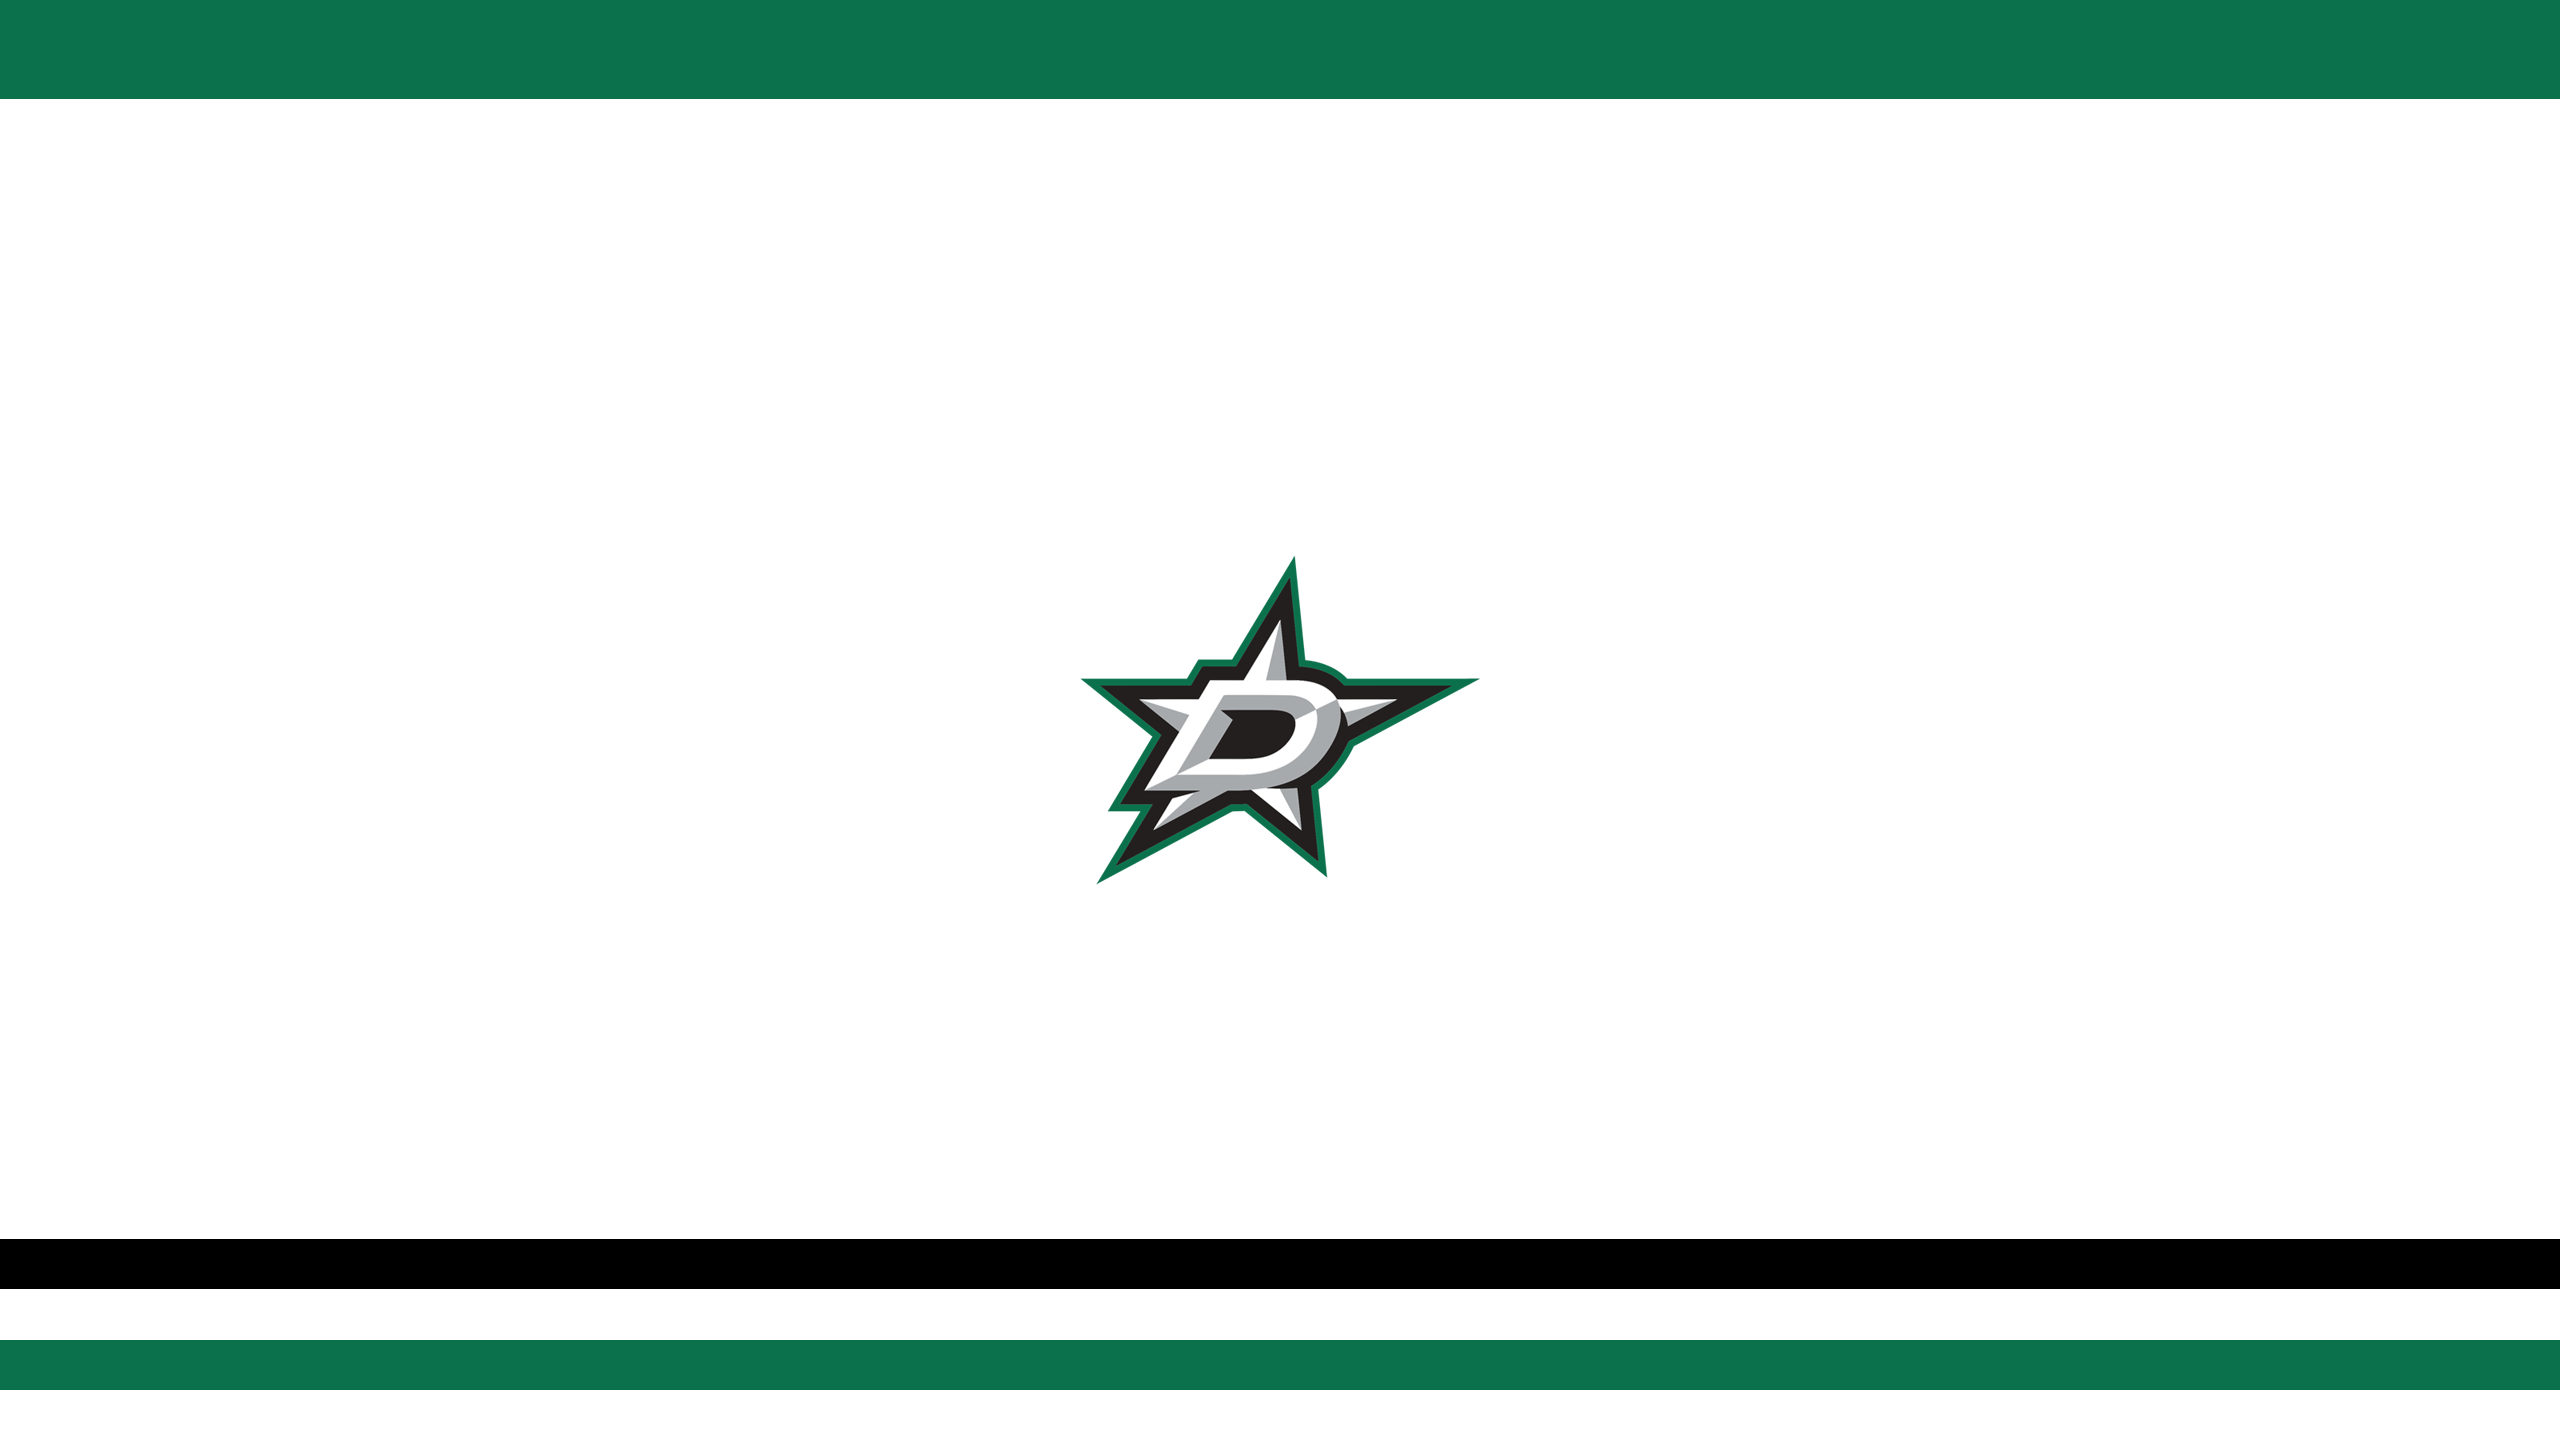 Dallas Stars (Away)